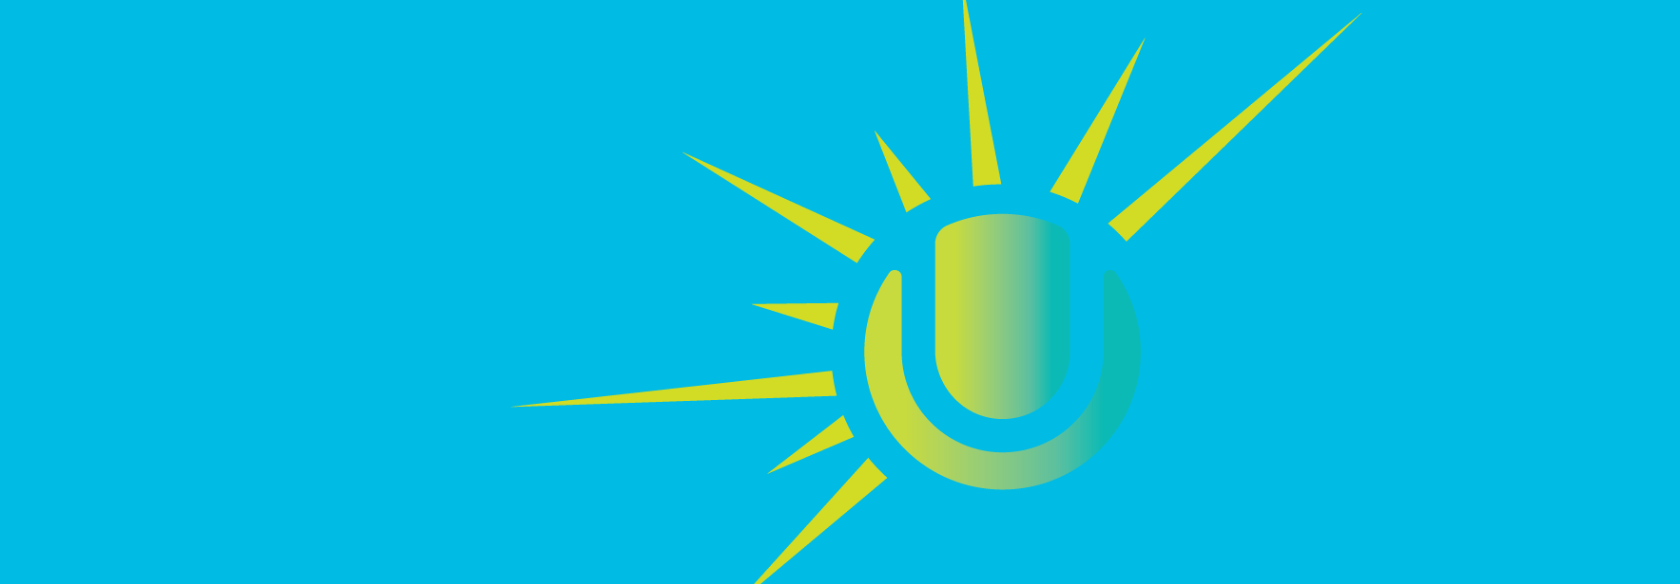 UTR - Universal Tennis Rating